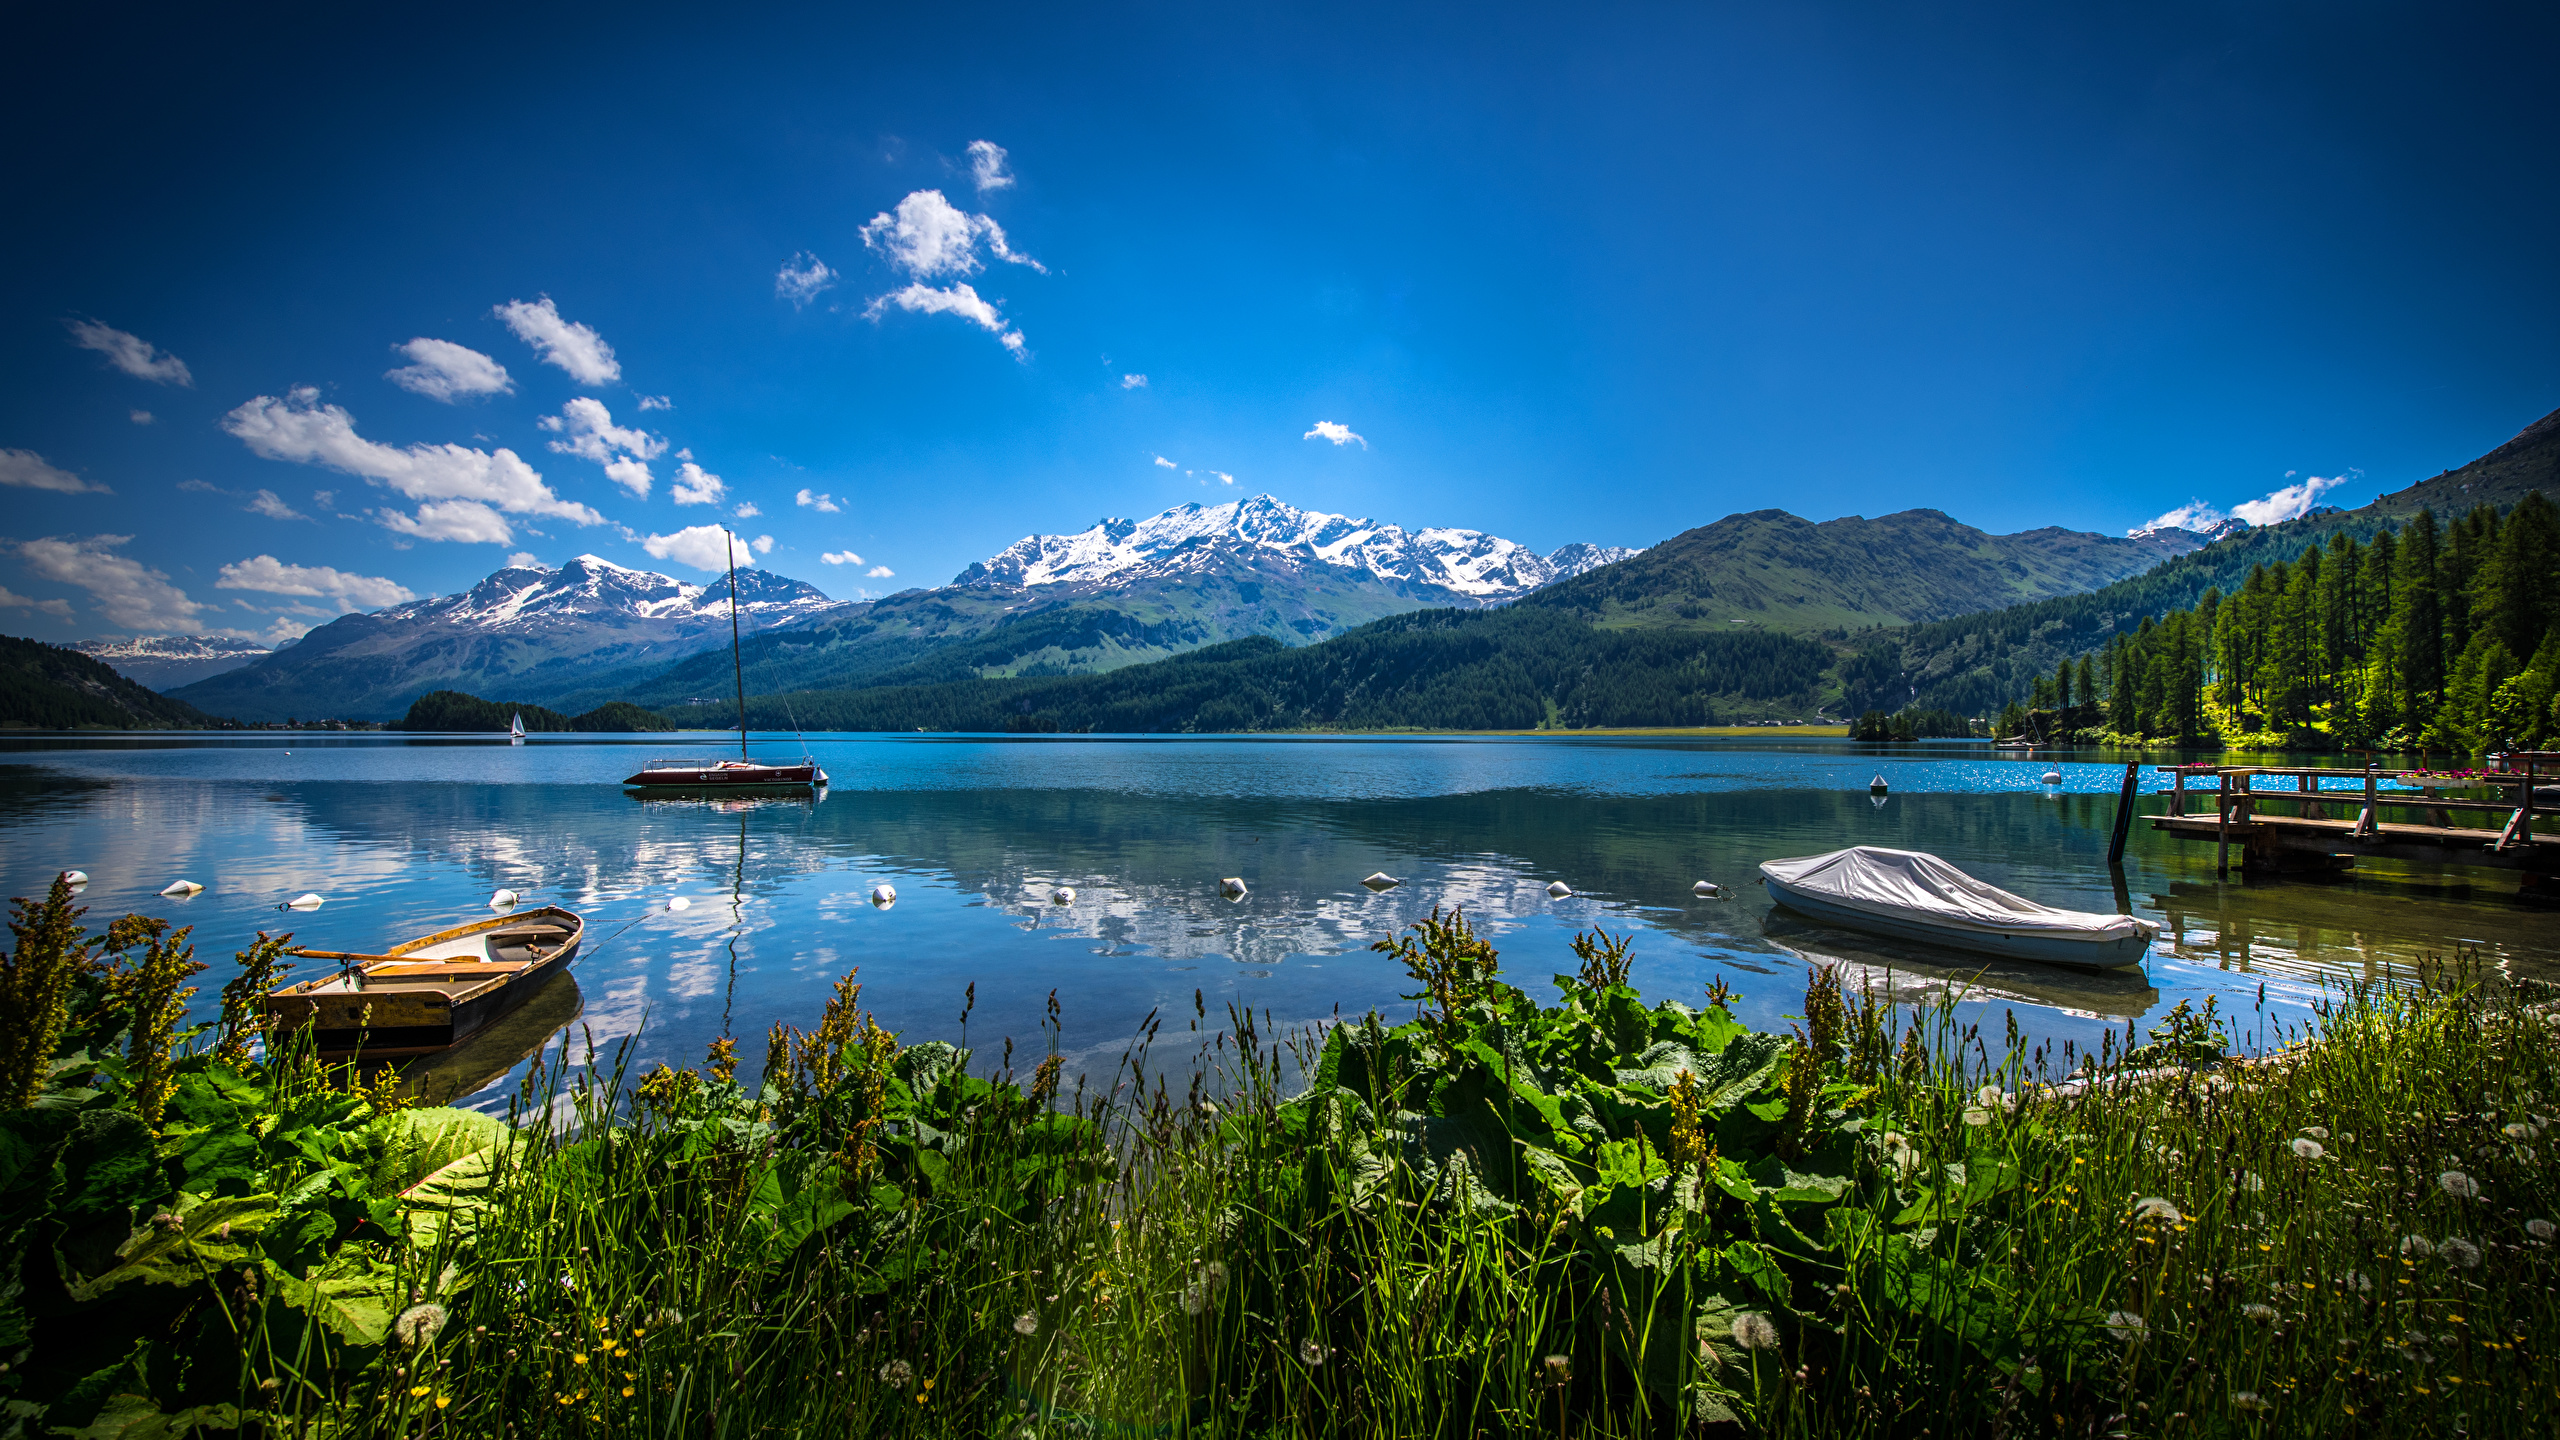 Wallpaper Switzerland Lake Sils Nature Mountain Scenery 2560x1440